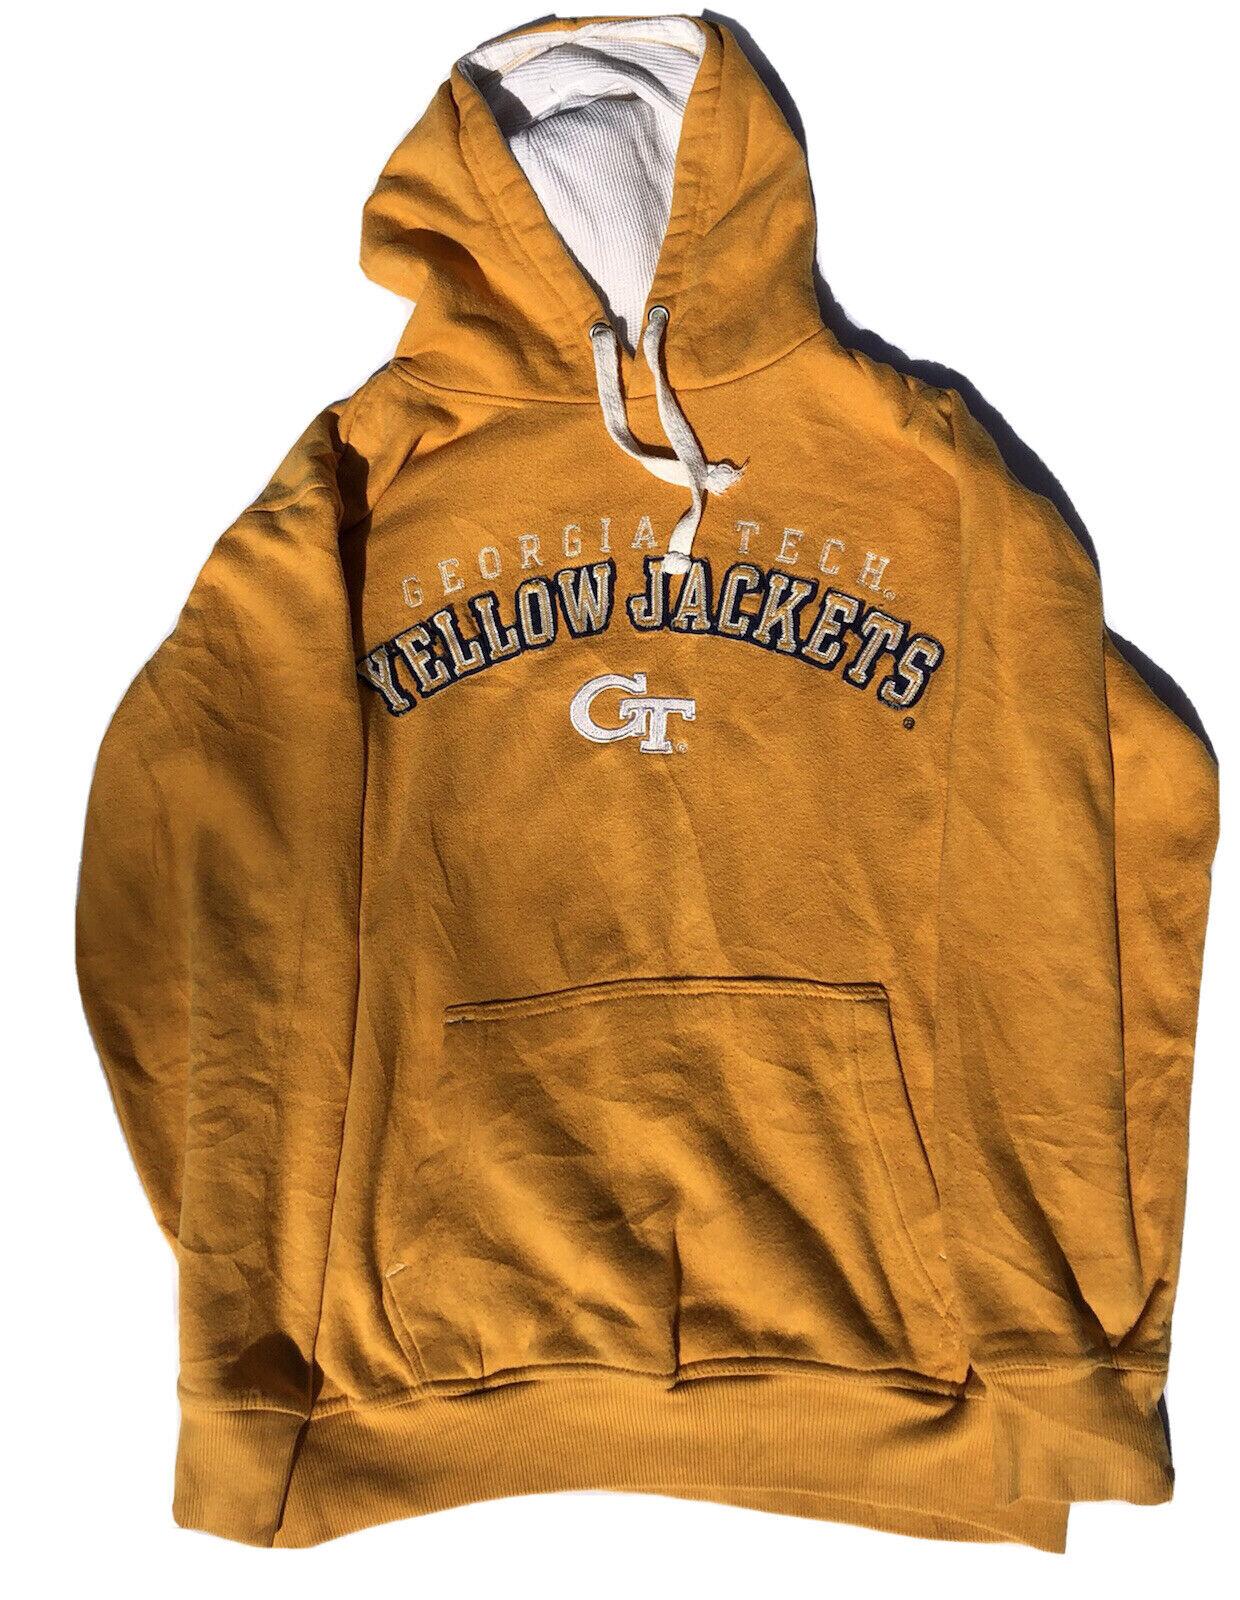 Georgia Tech Yellow Jackets vintage Sweatshirt/Hoodie Men's Size S American